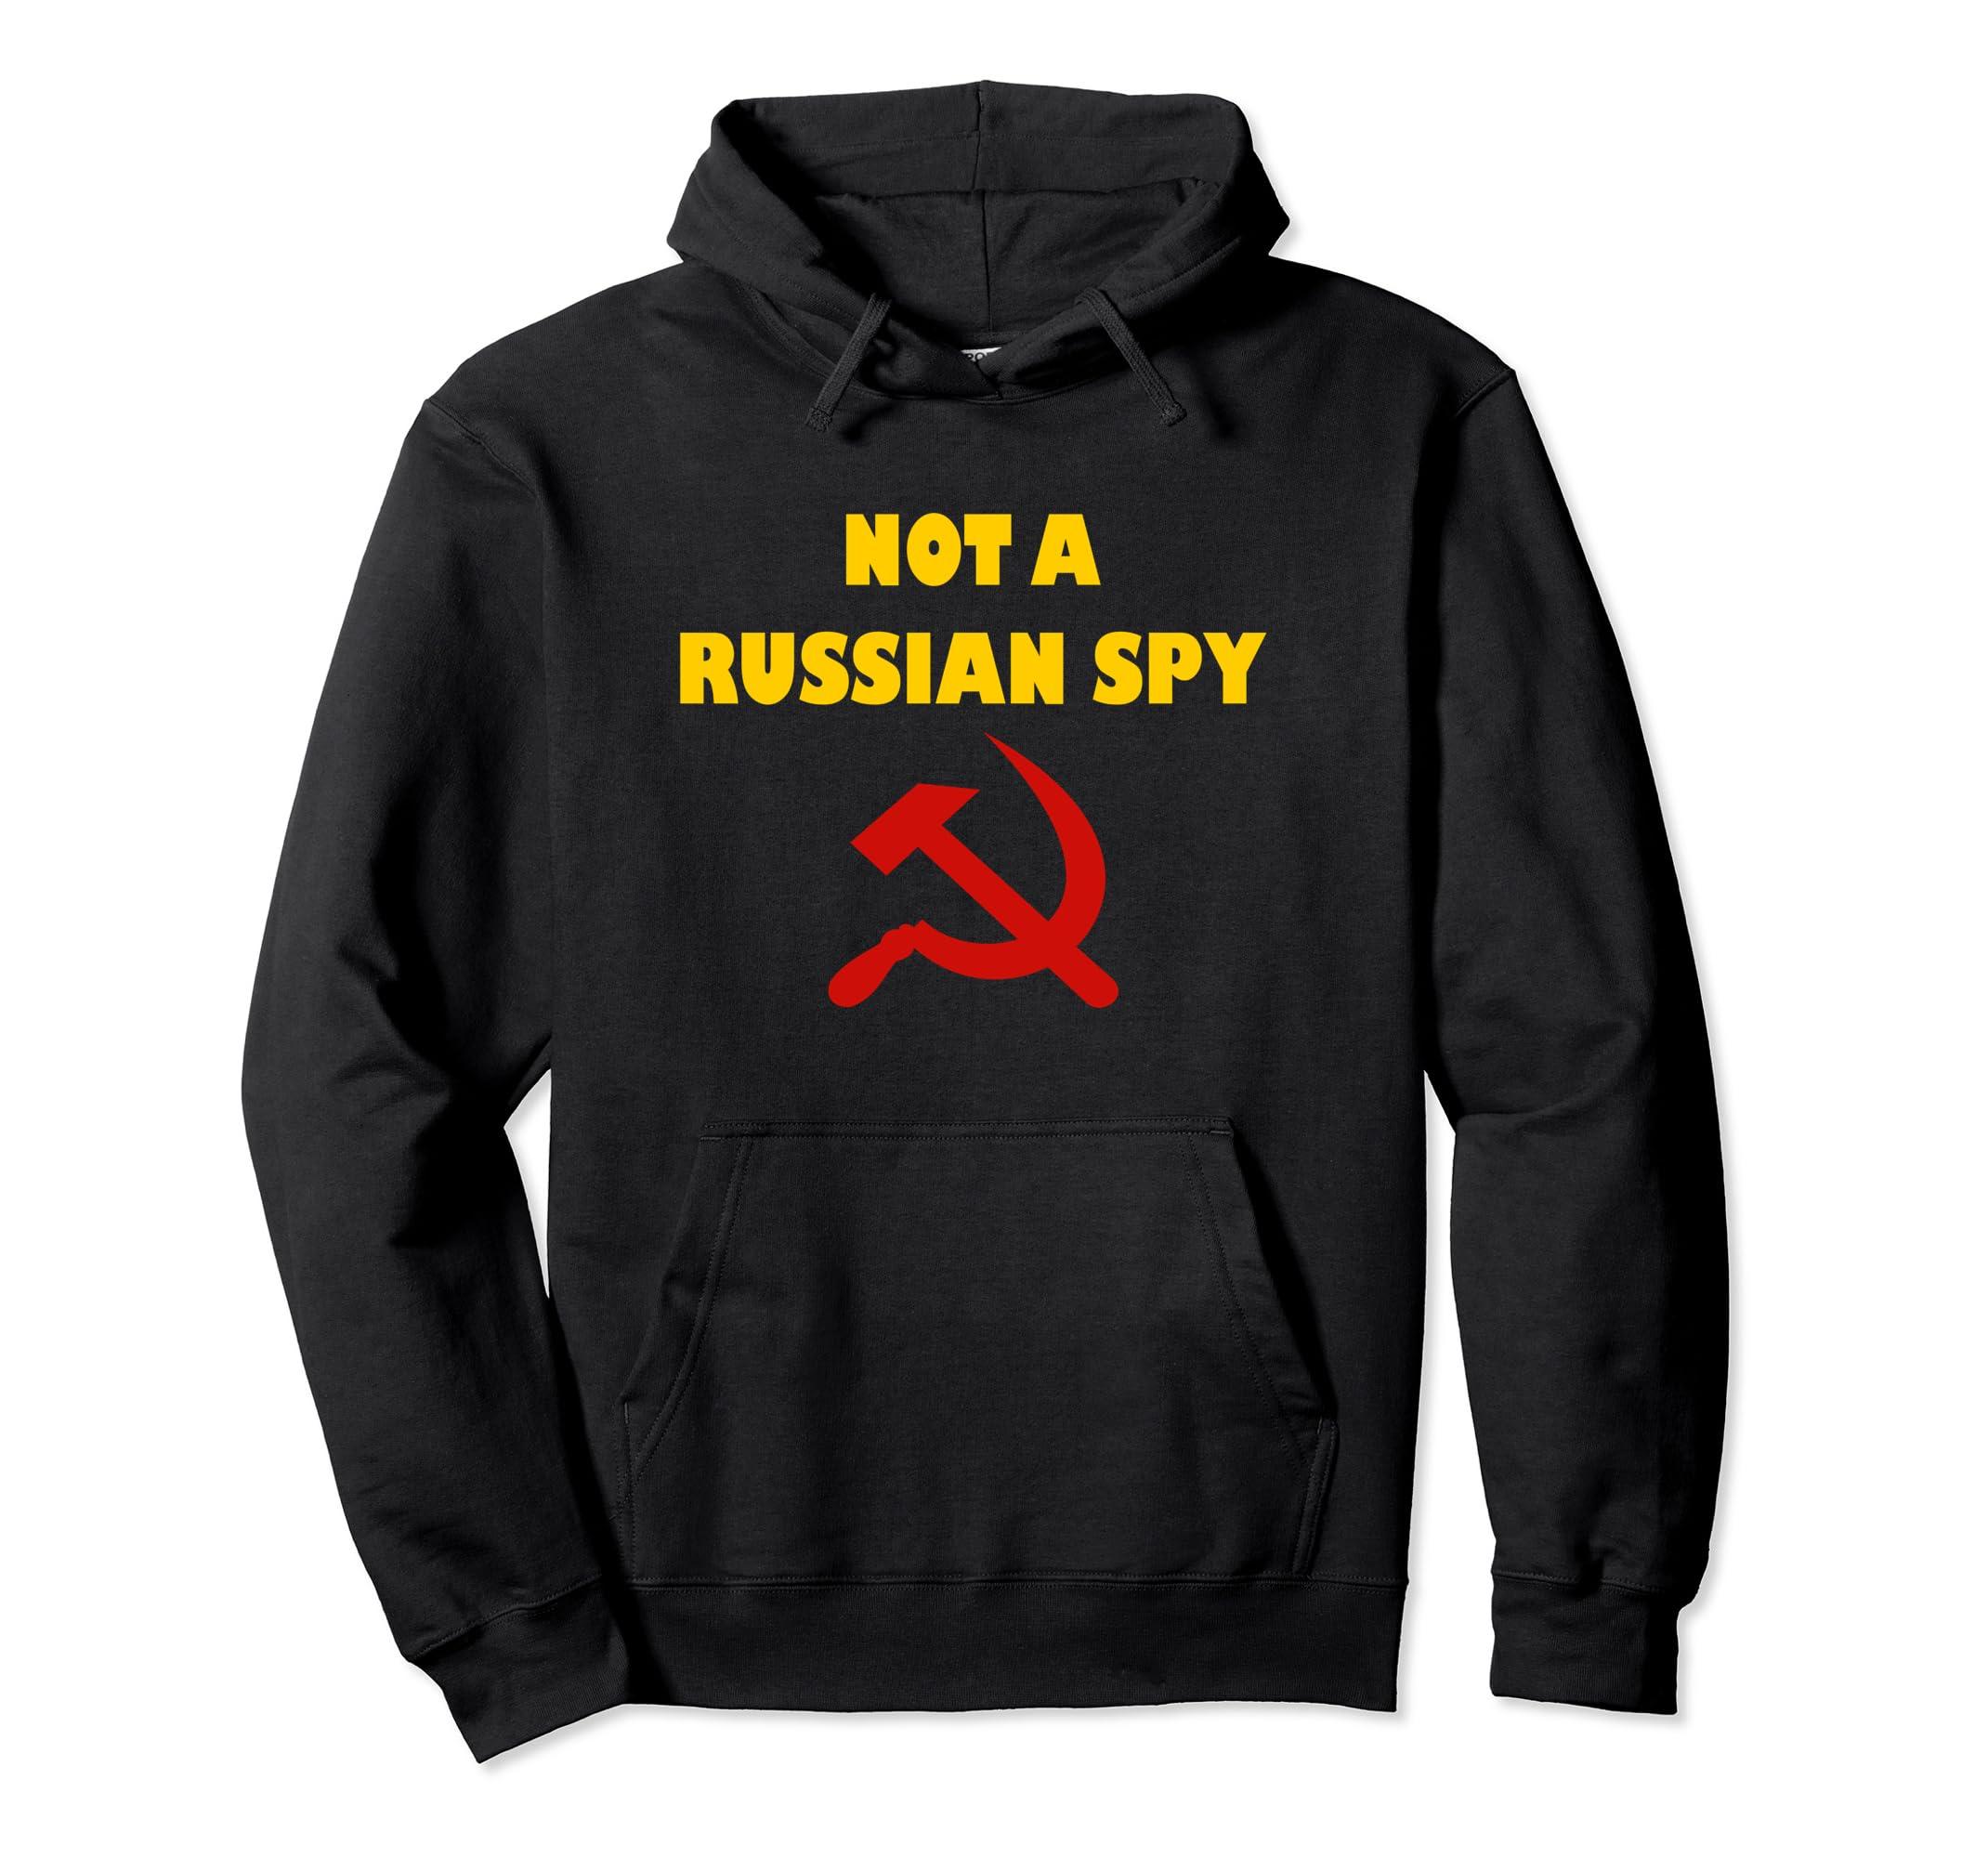 Not A Russian Spy Halloween Costume Hooded Sweatshirt-mt